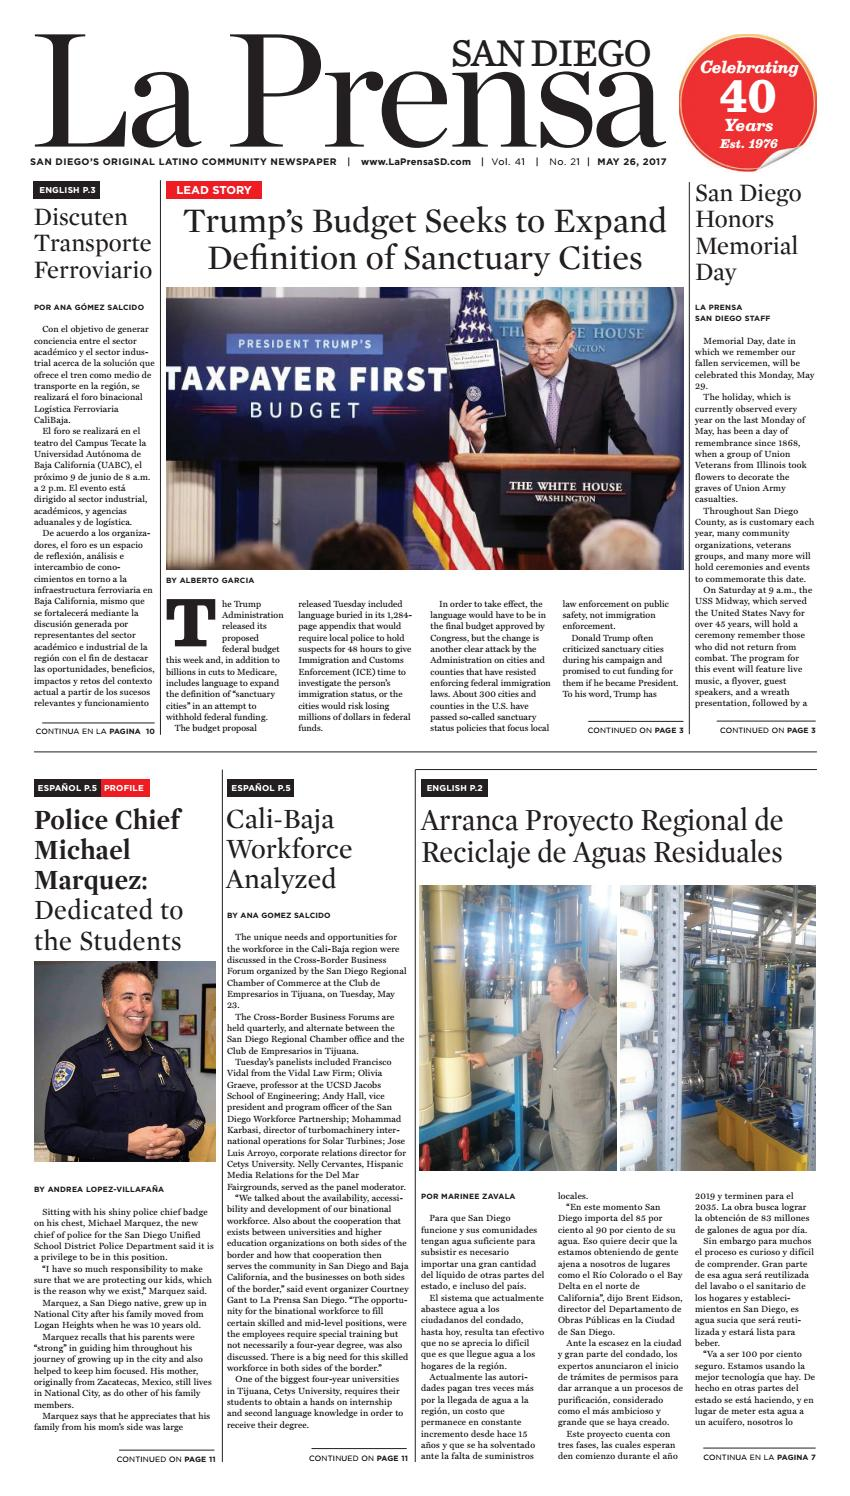 La Prensa San Diego - May 26, 2017 by La Prensa San Diego - issuu